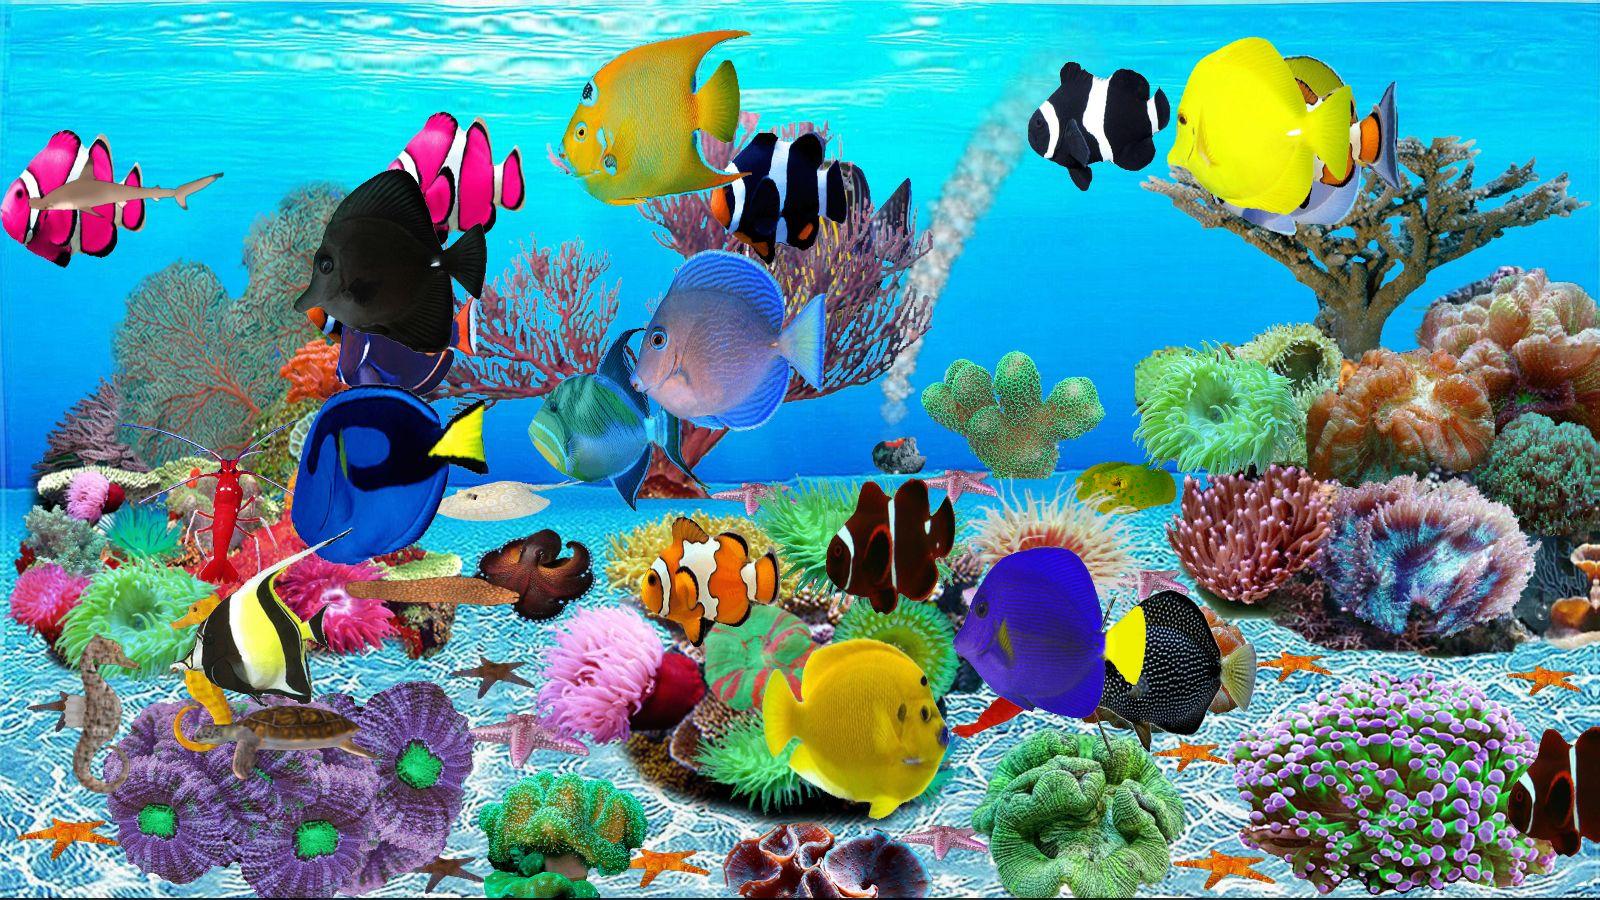 Undersea World Aquarium [Download] (Enjoyment Ebook Of The Music)